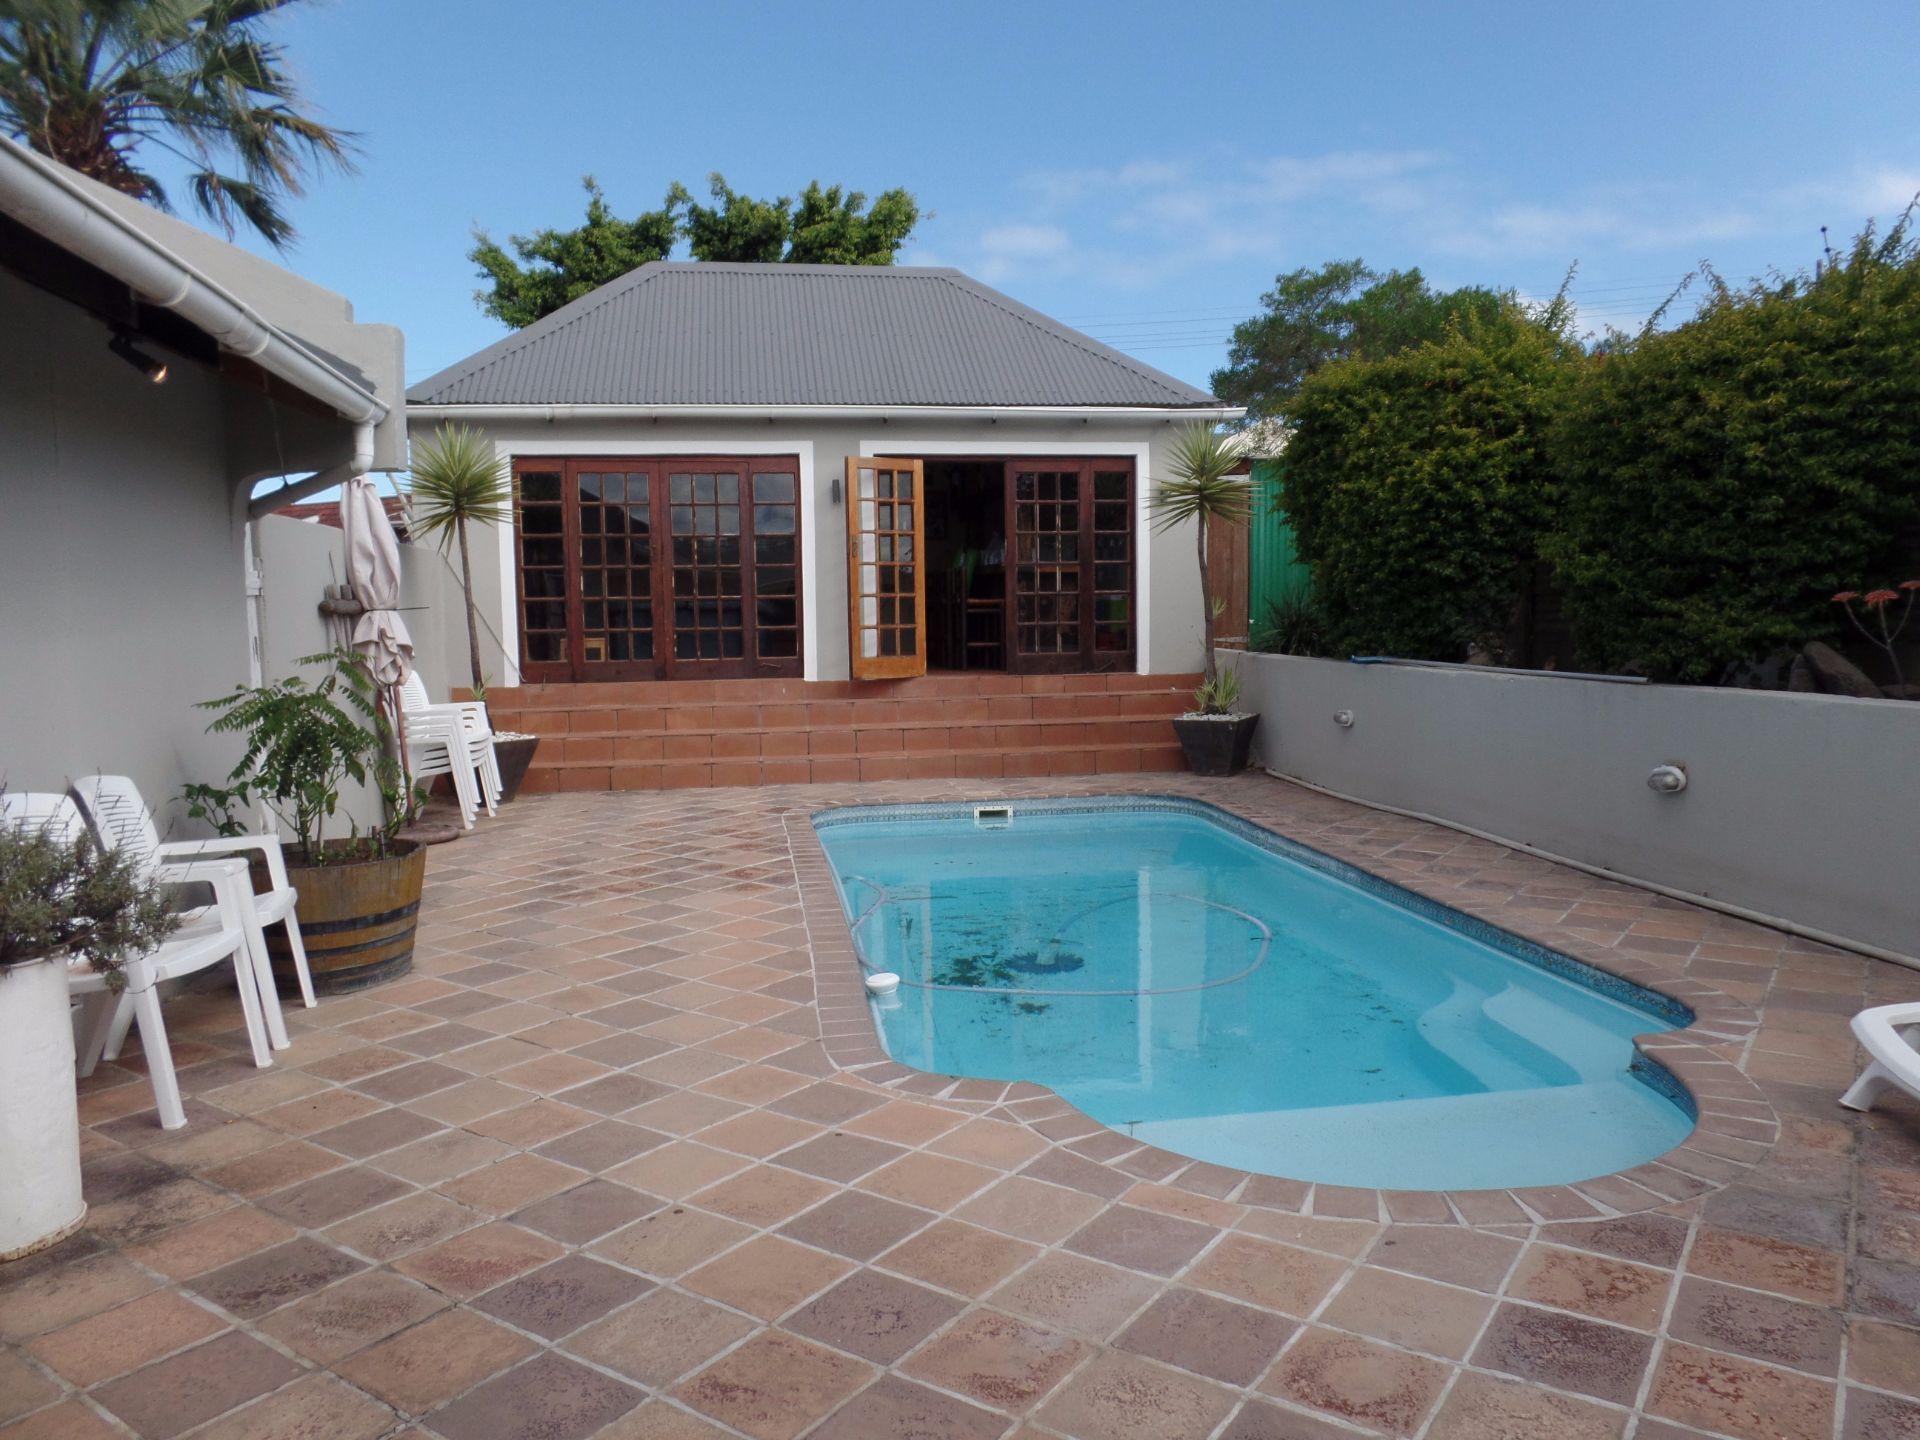 house for sale in beacon bay 3 bedroom 10 22 cyberprop